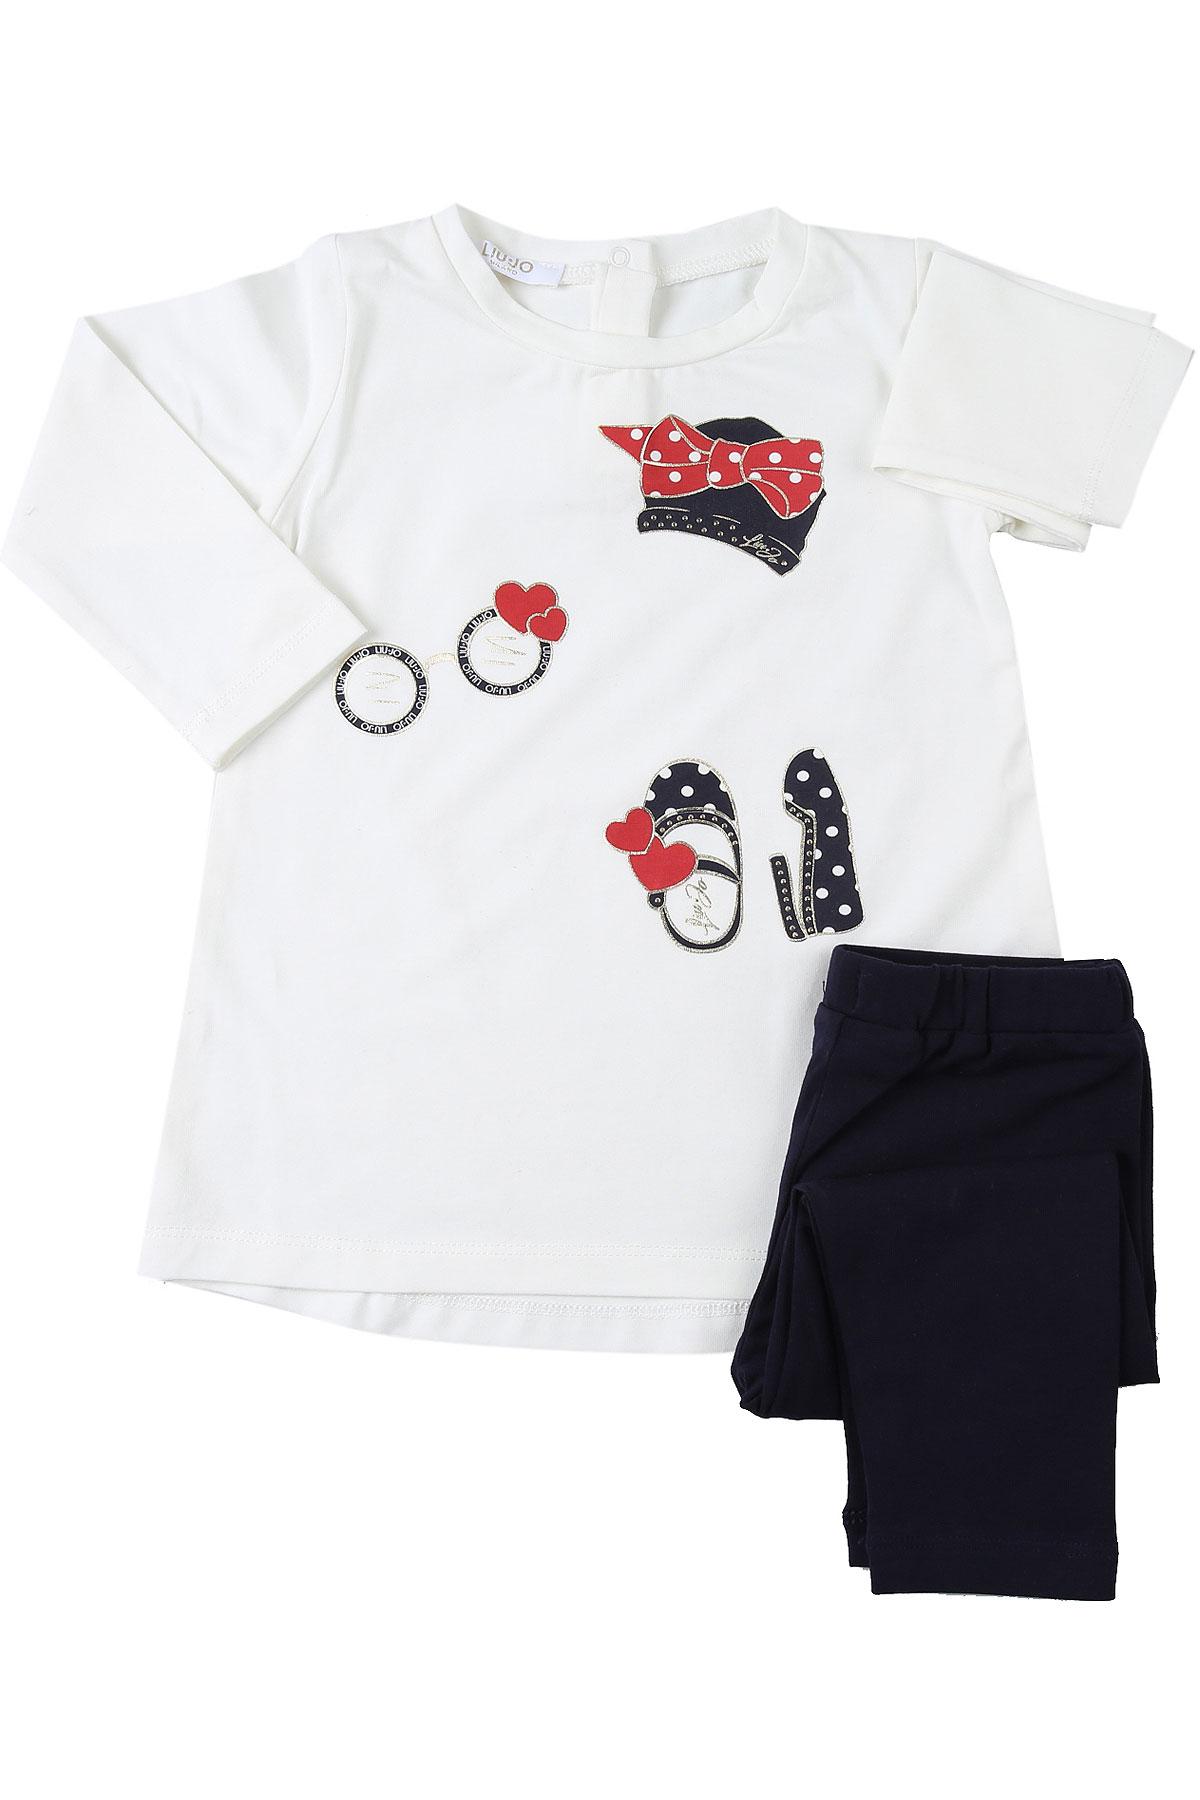 Liu Jo Baby Sets for Girls On Sale, White Snow, Cotton, 2019, 12M 12M 18M 3M 6M 6M 9M